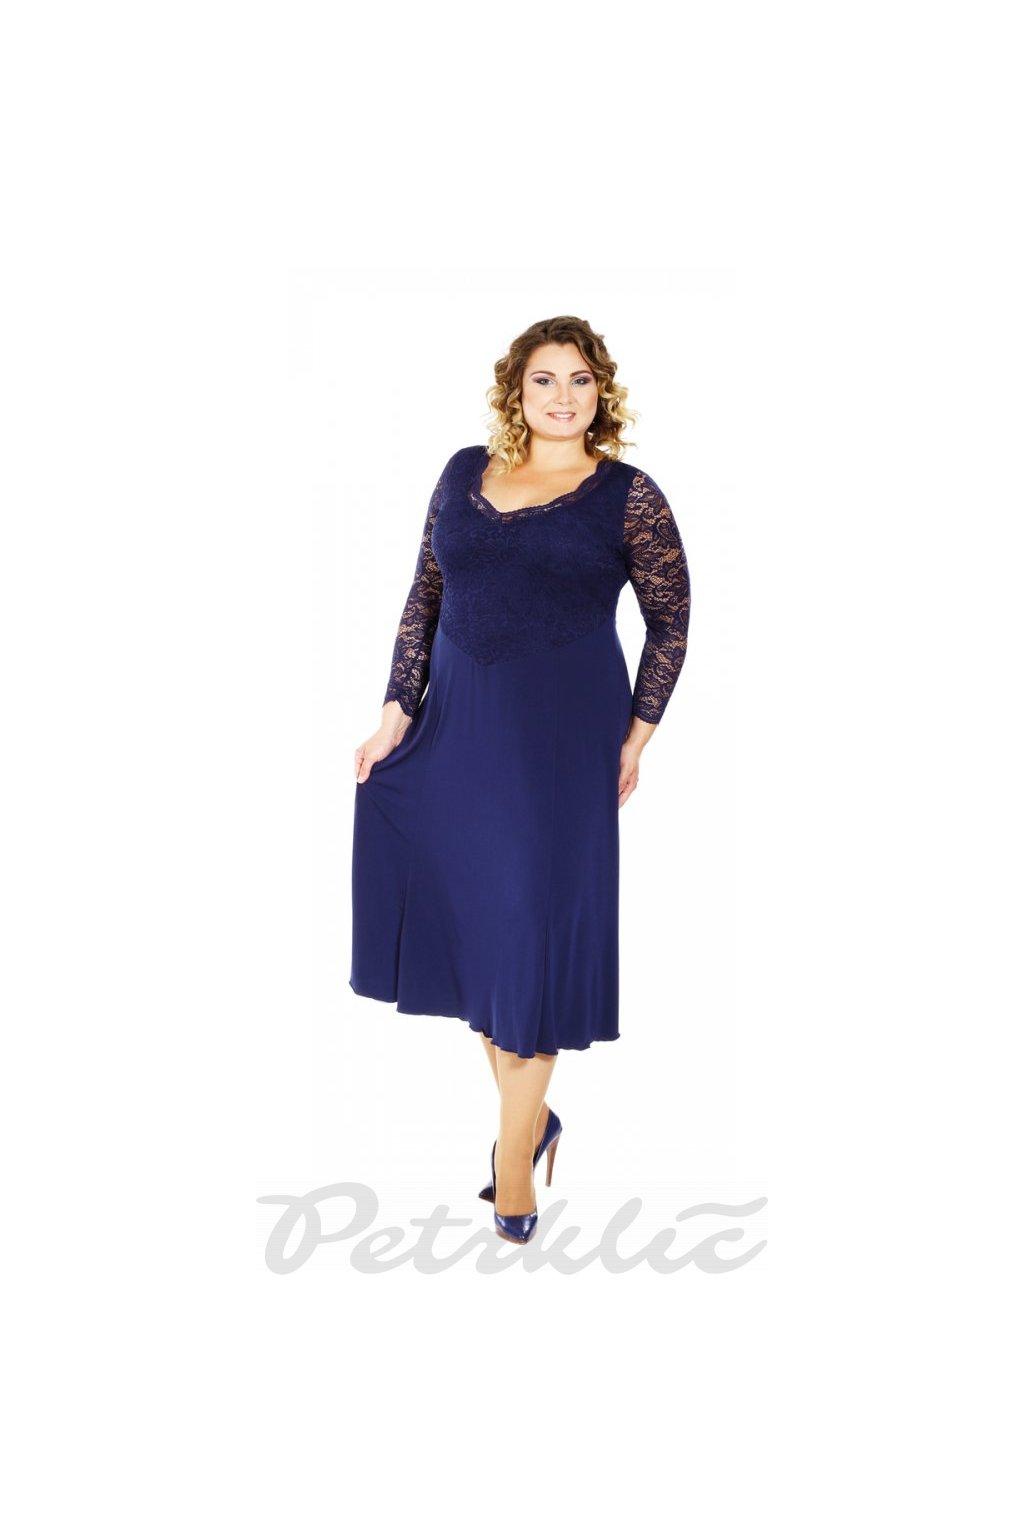 KATARÍNA - šaty 130 - 135 cm